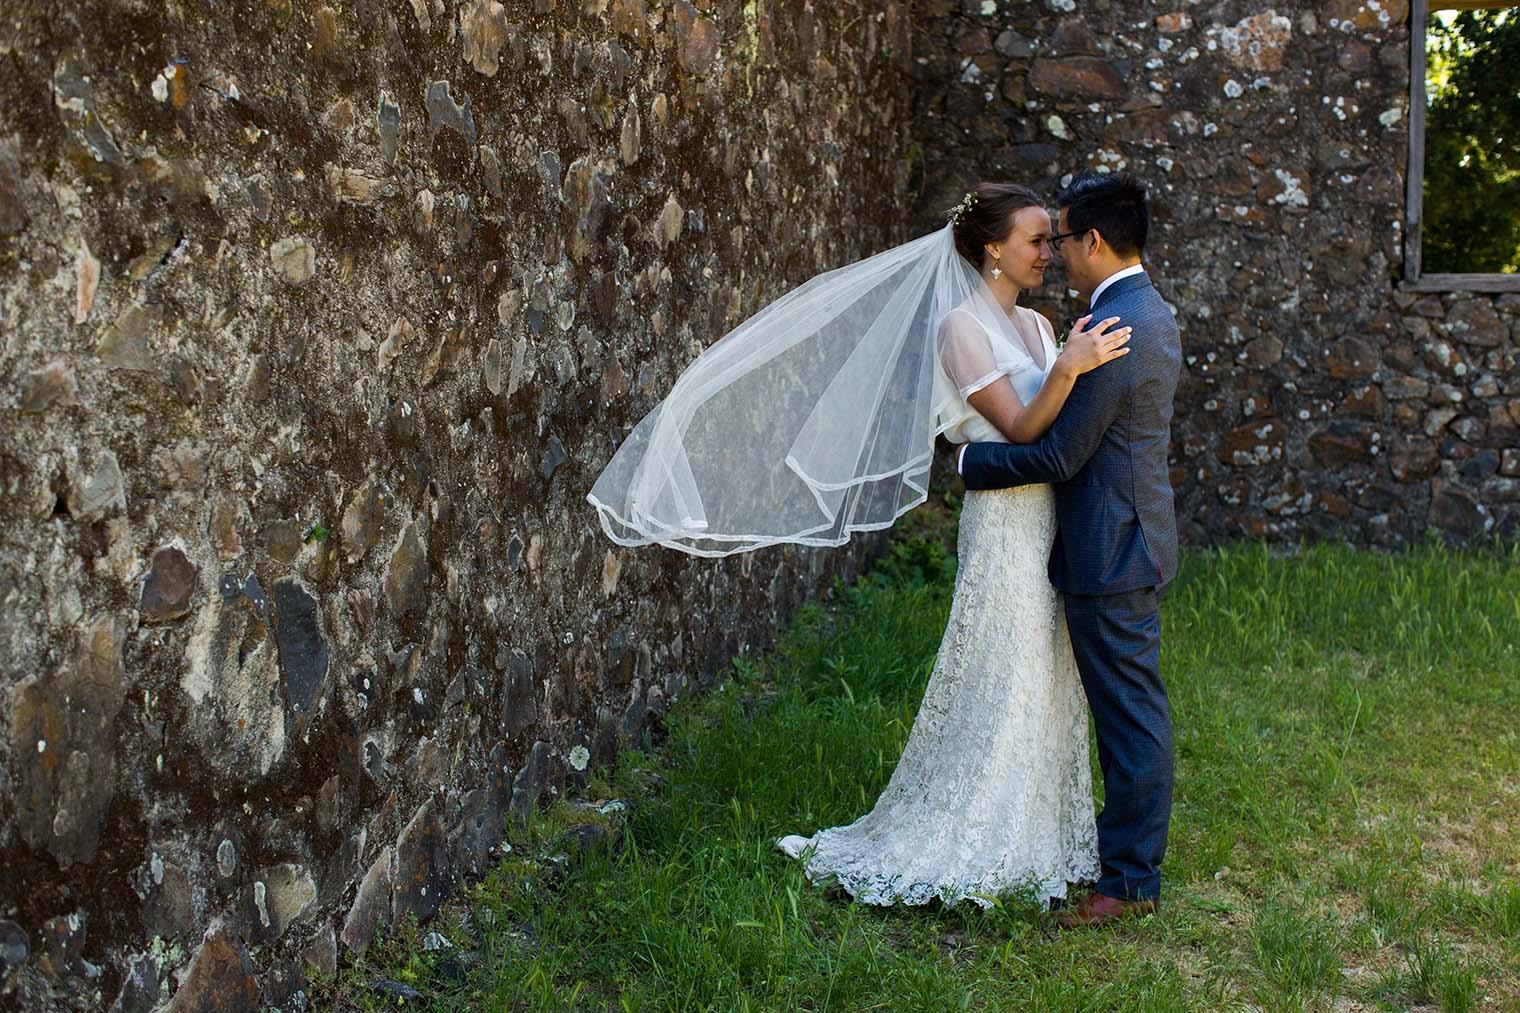 wedding photos at jack london state historic park